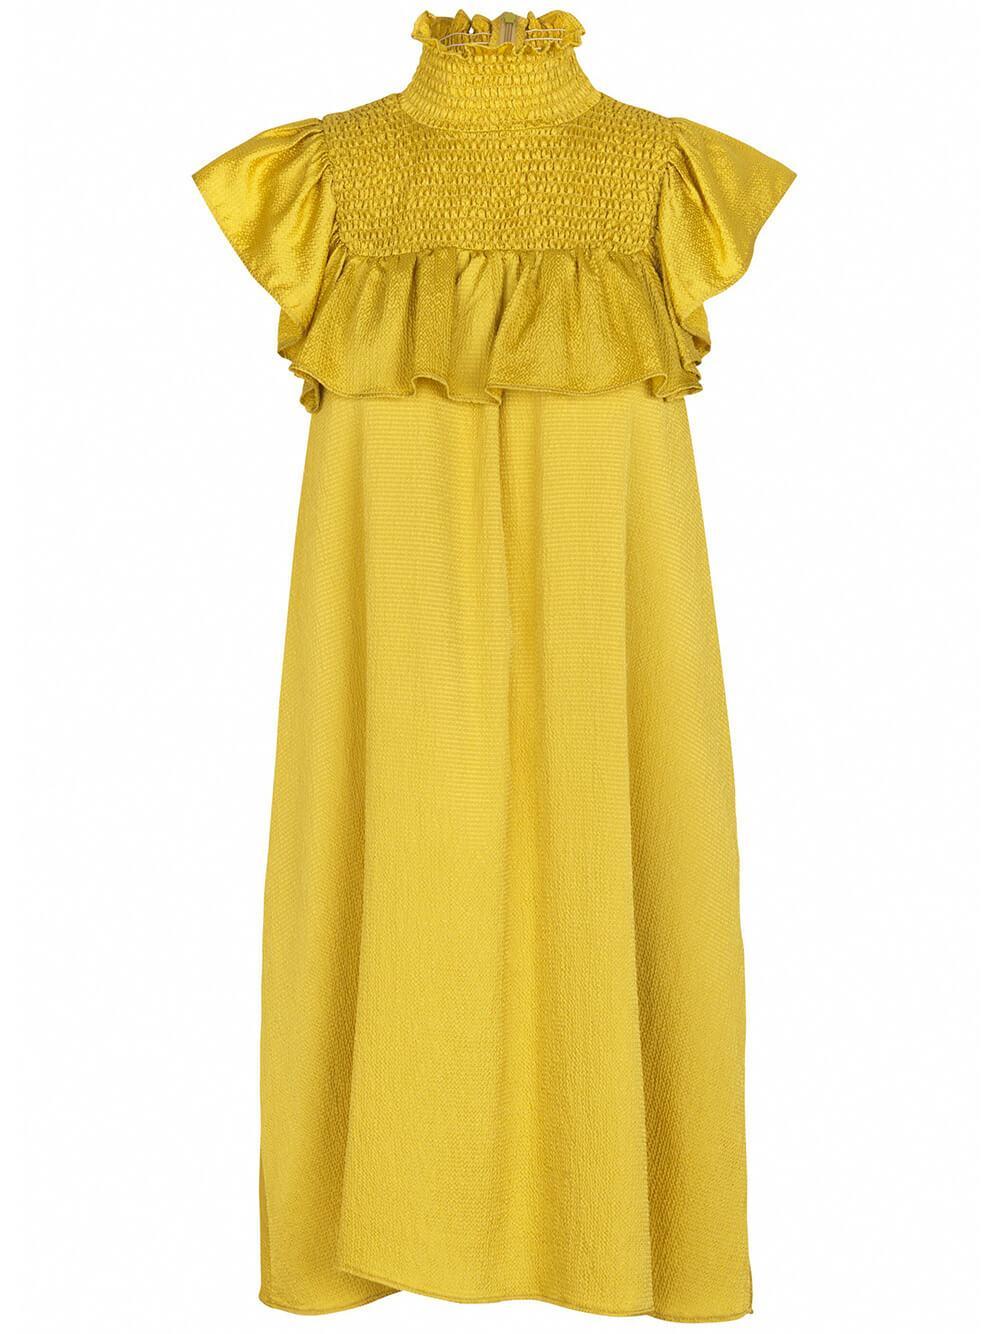 Aelaney High Neck Dress